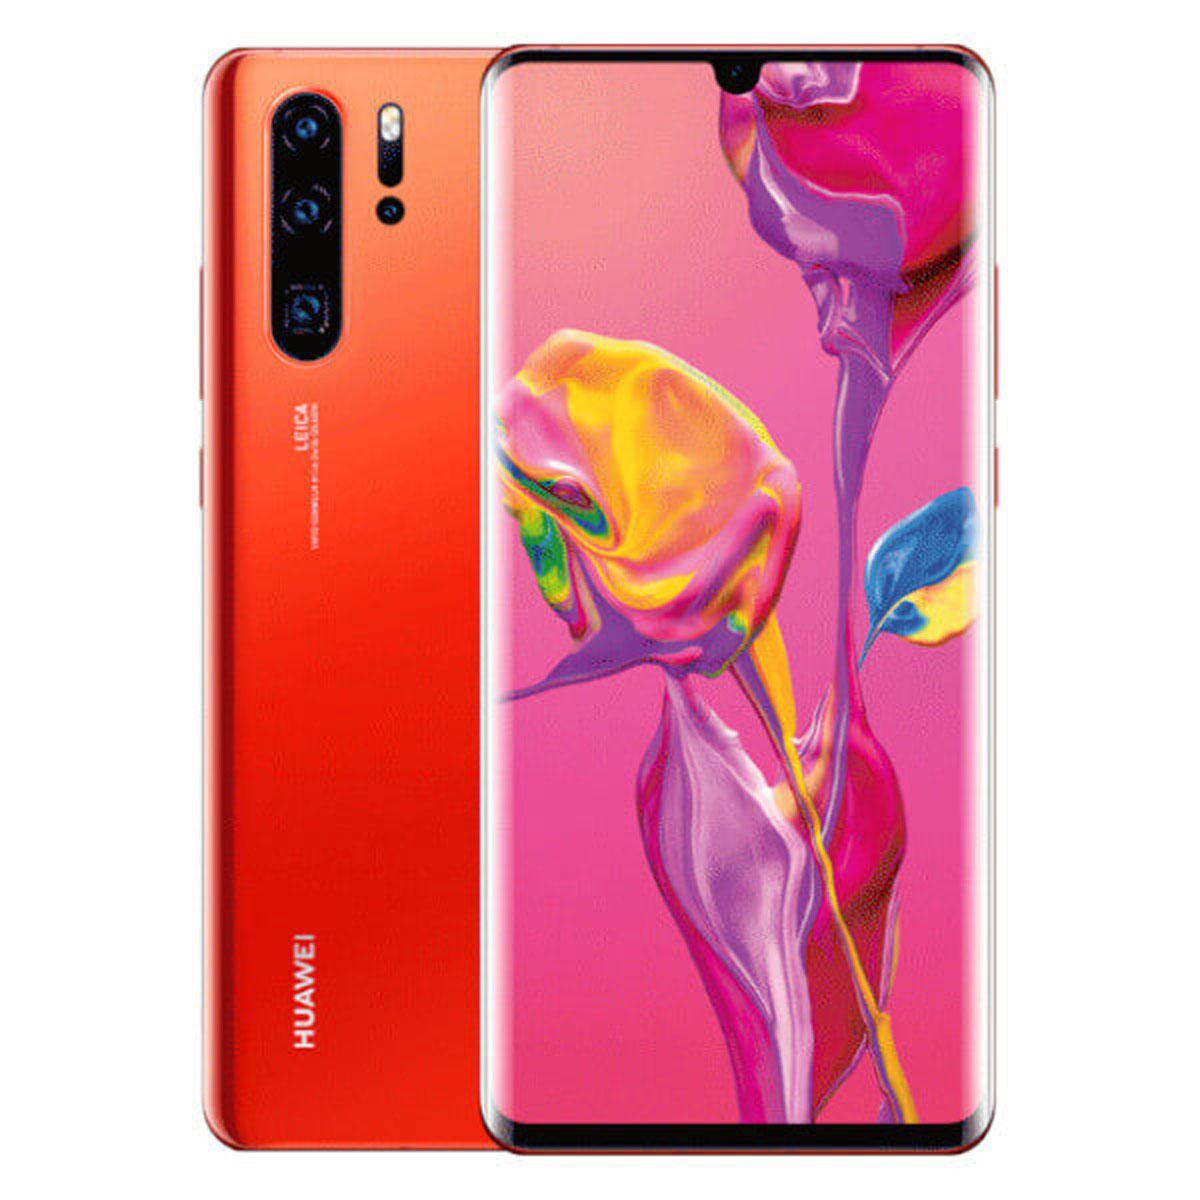 Huawei p30 pro 8gb/128gb amber sunrise